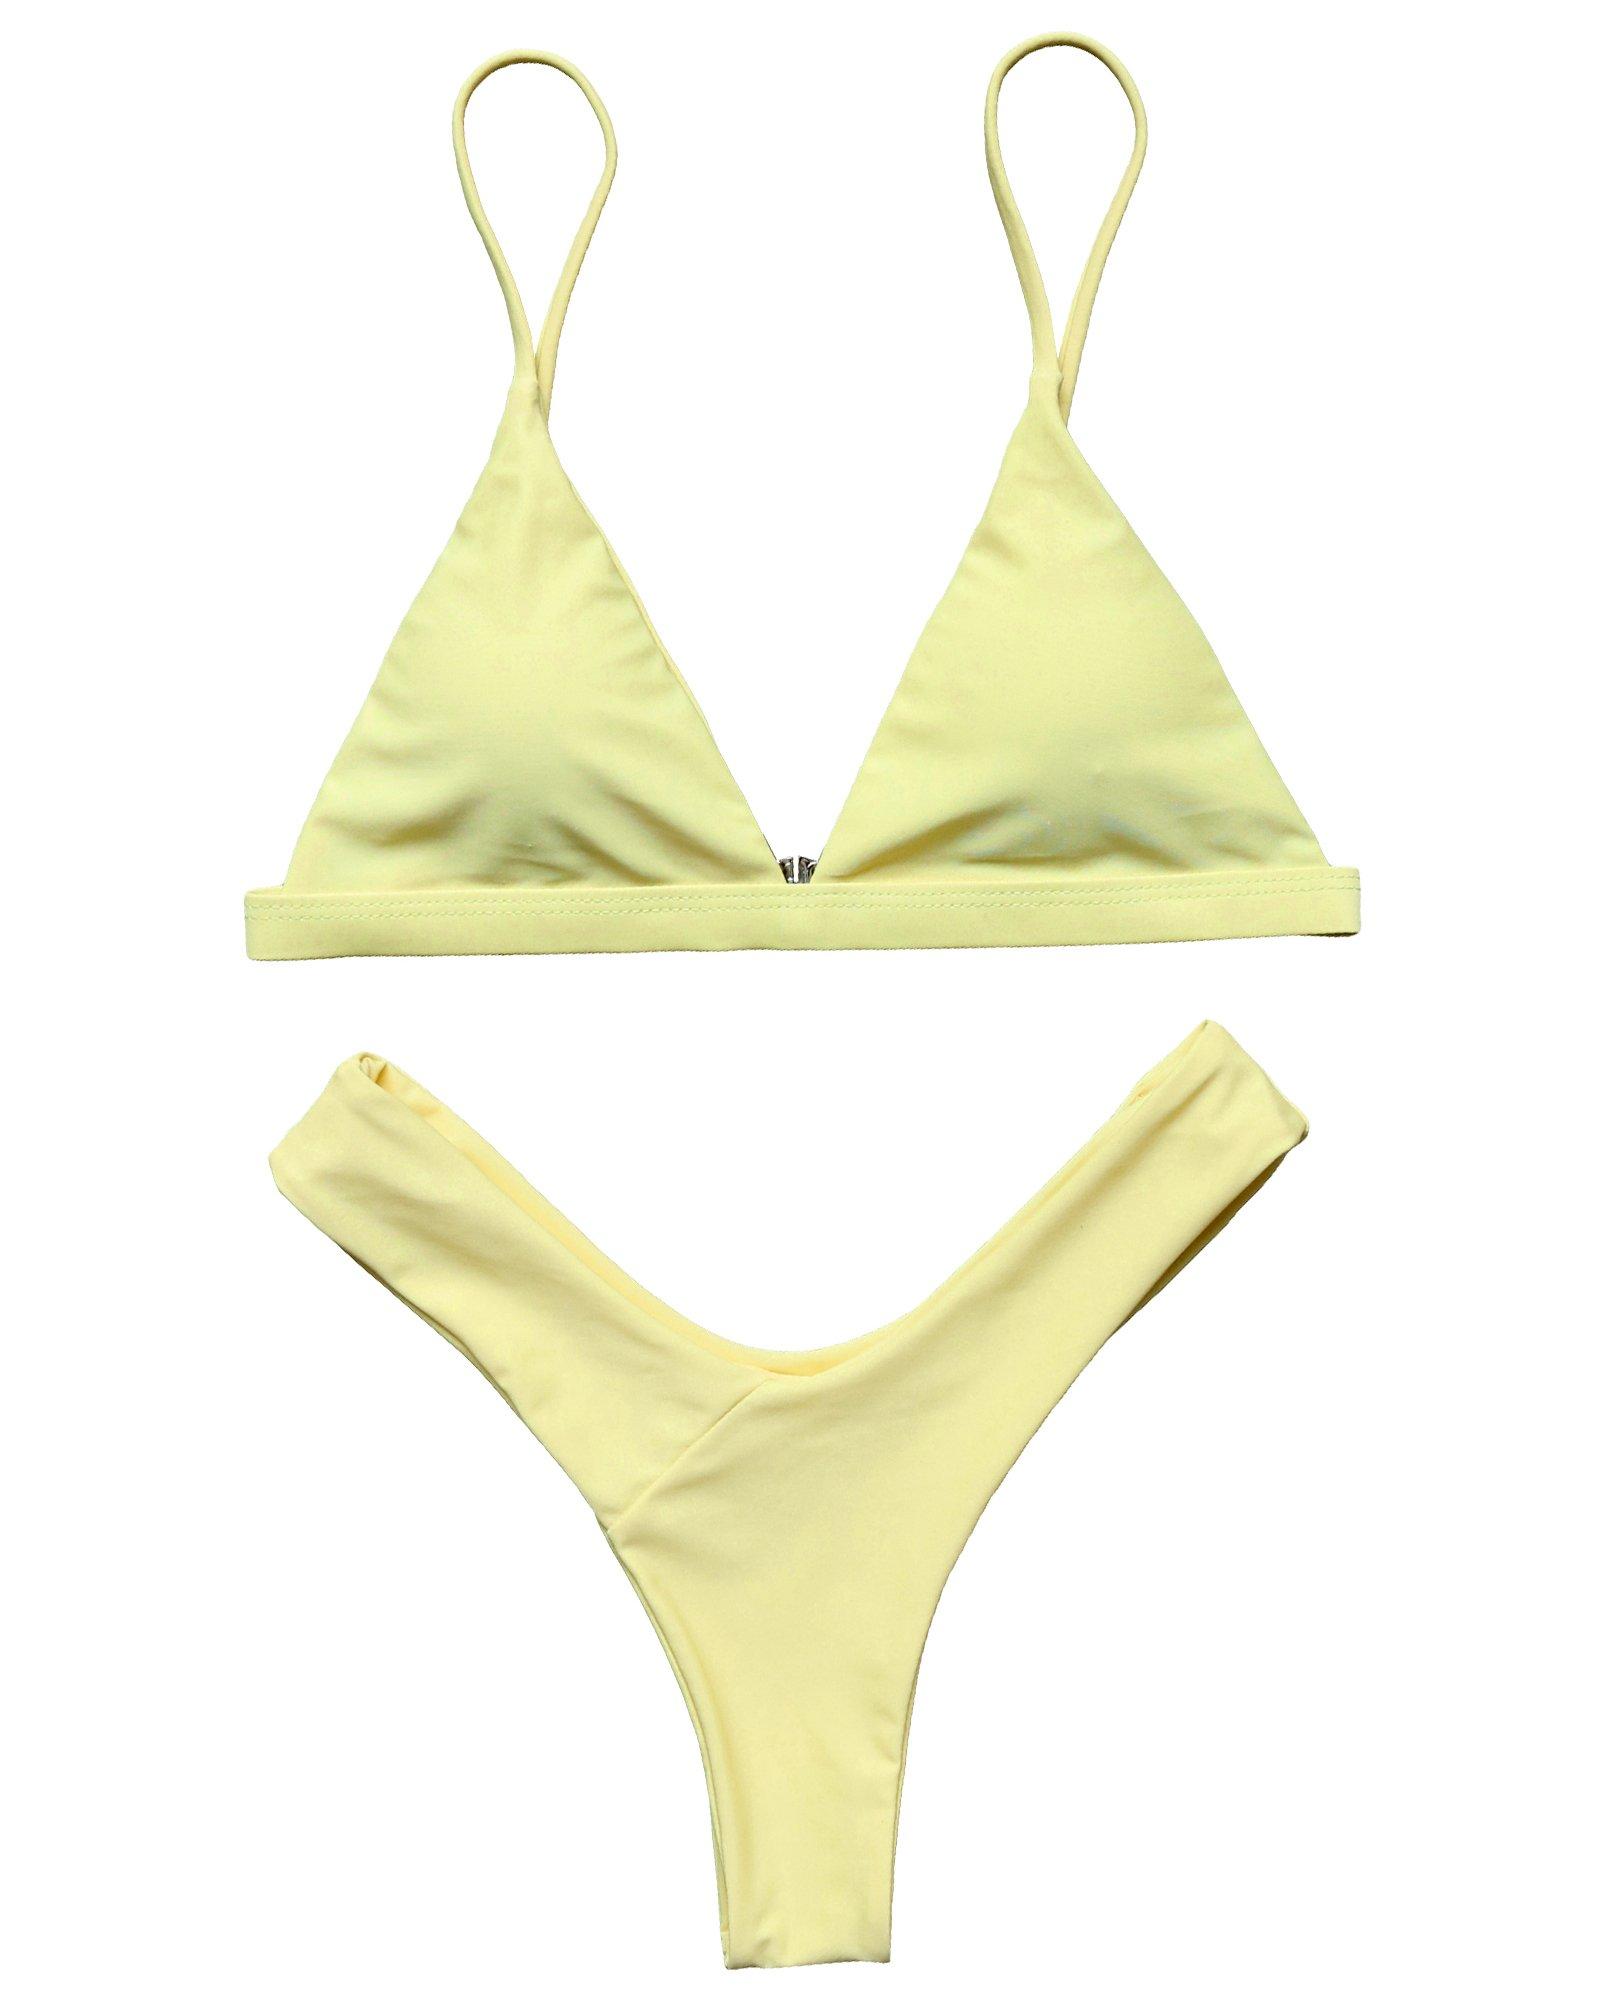 LEESMILE Women 2 Piece Brazilian Top V Style Bottom Bikini Set Spaghetti Strap Swimsuit(S (US Size 2-4),Yellow)